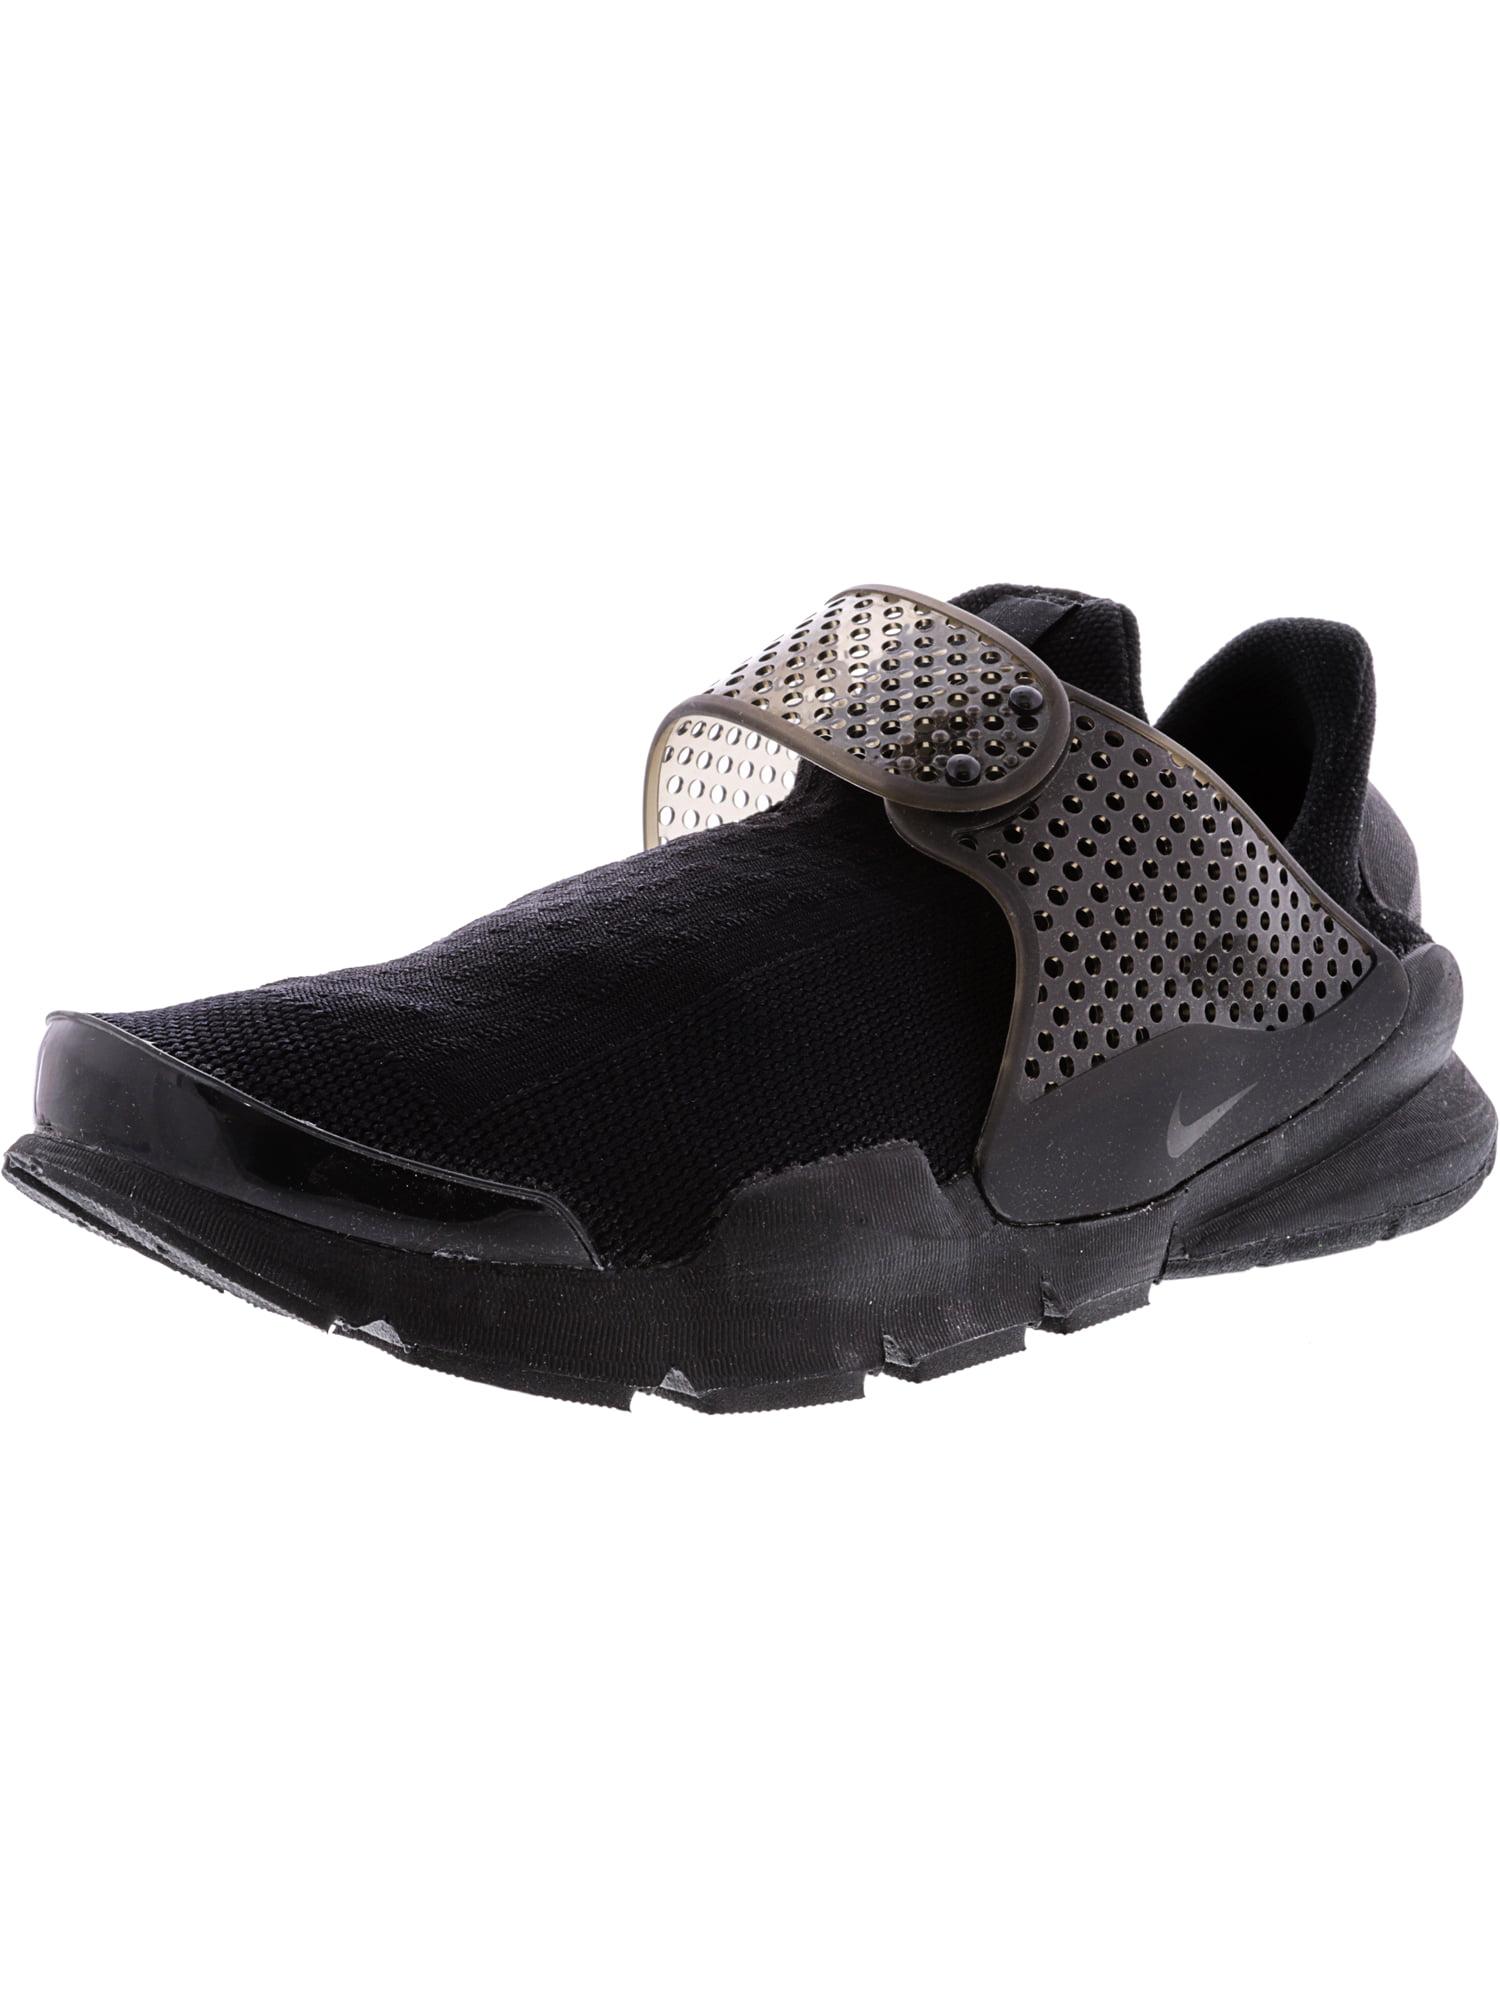 Nike Women's Sock Dart Black / Black-Volt Low Top Running Shoe - 7M